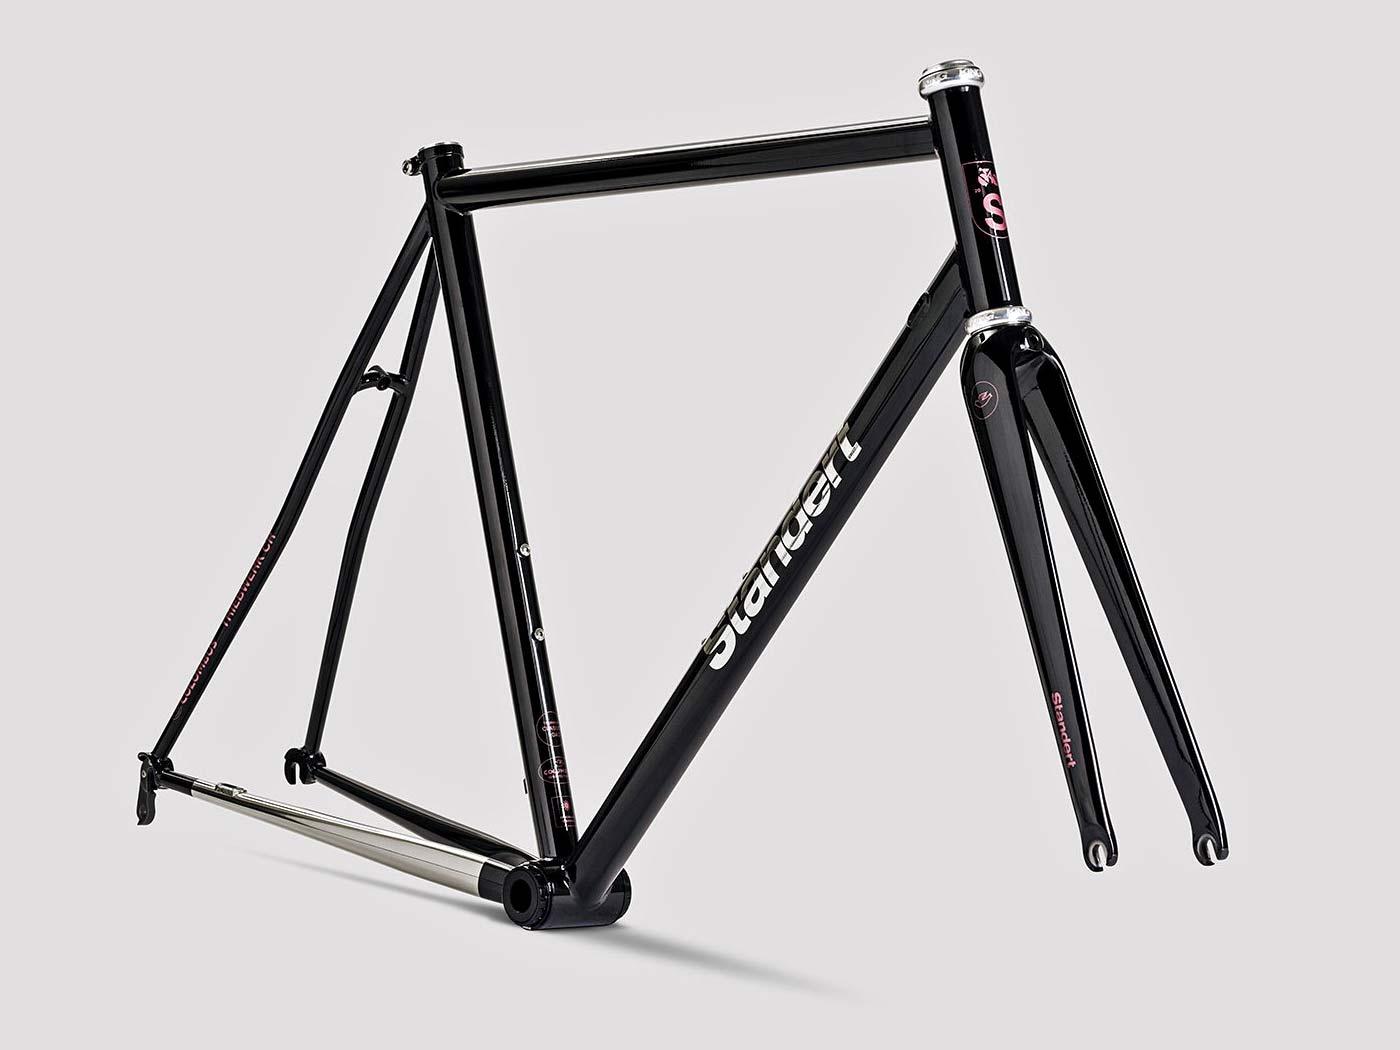 Standert Triebwerk CR classic lightweight steel rim brake road bike, frameset